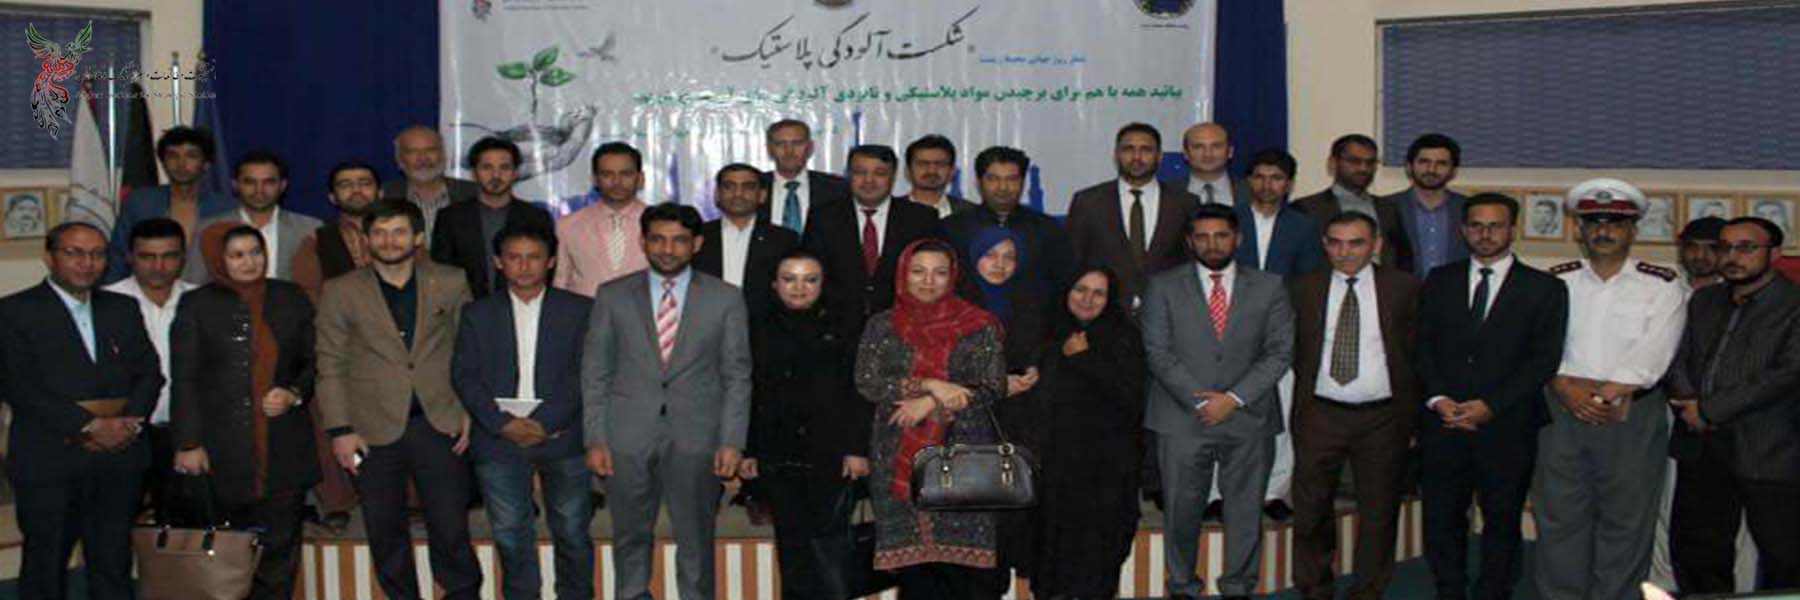 Celebration of World Environment Day in Herat